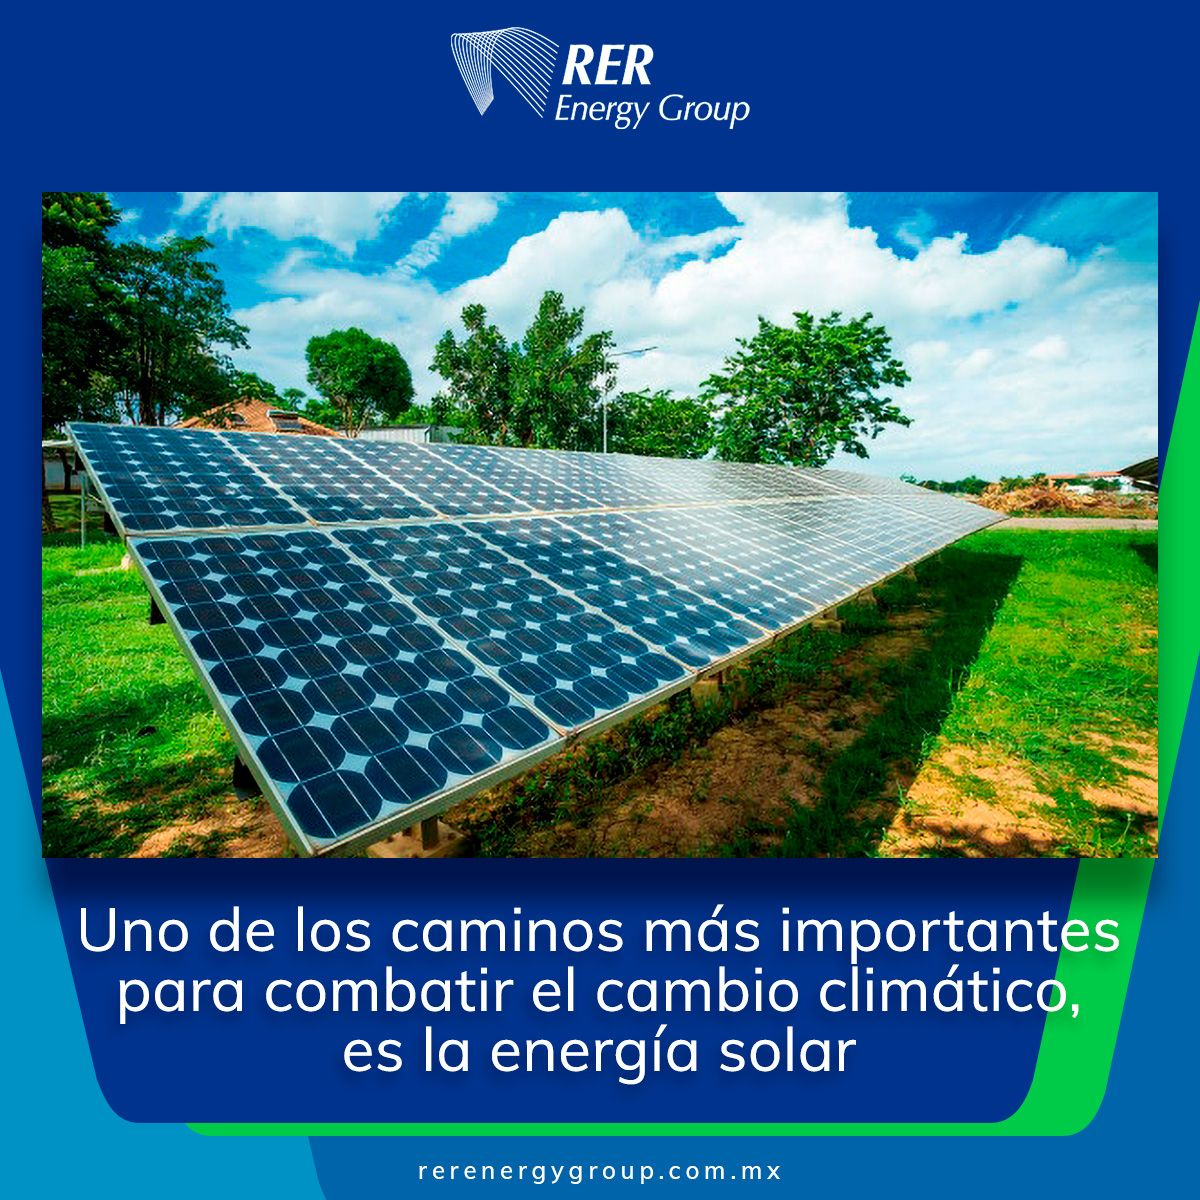 RER Energy Group México